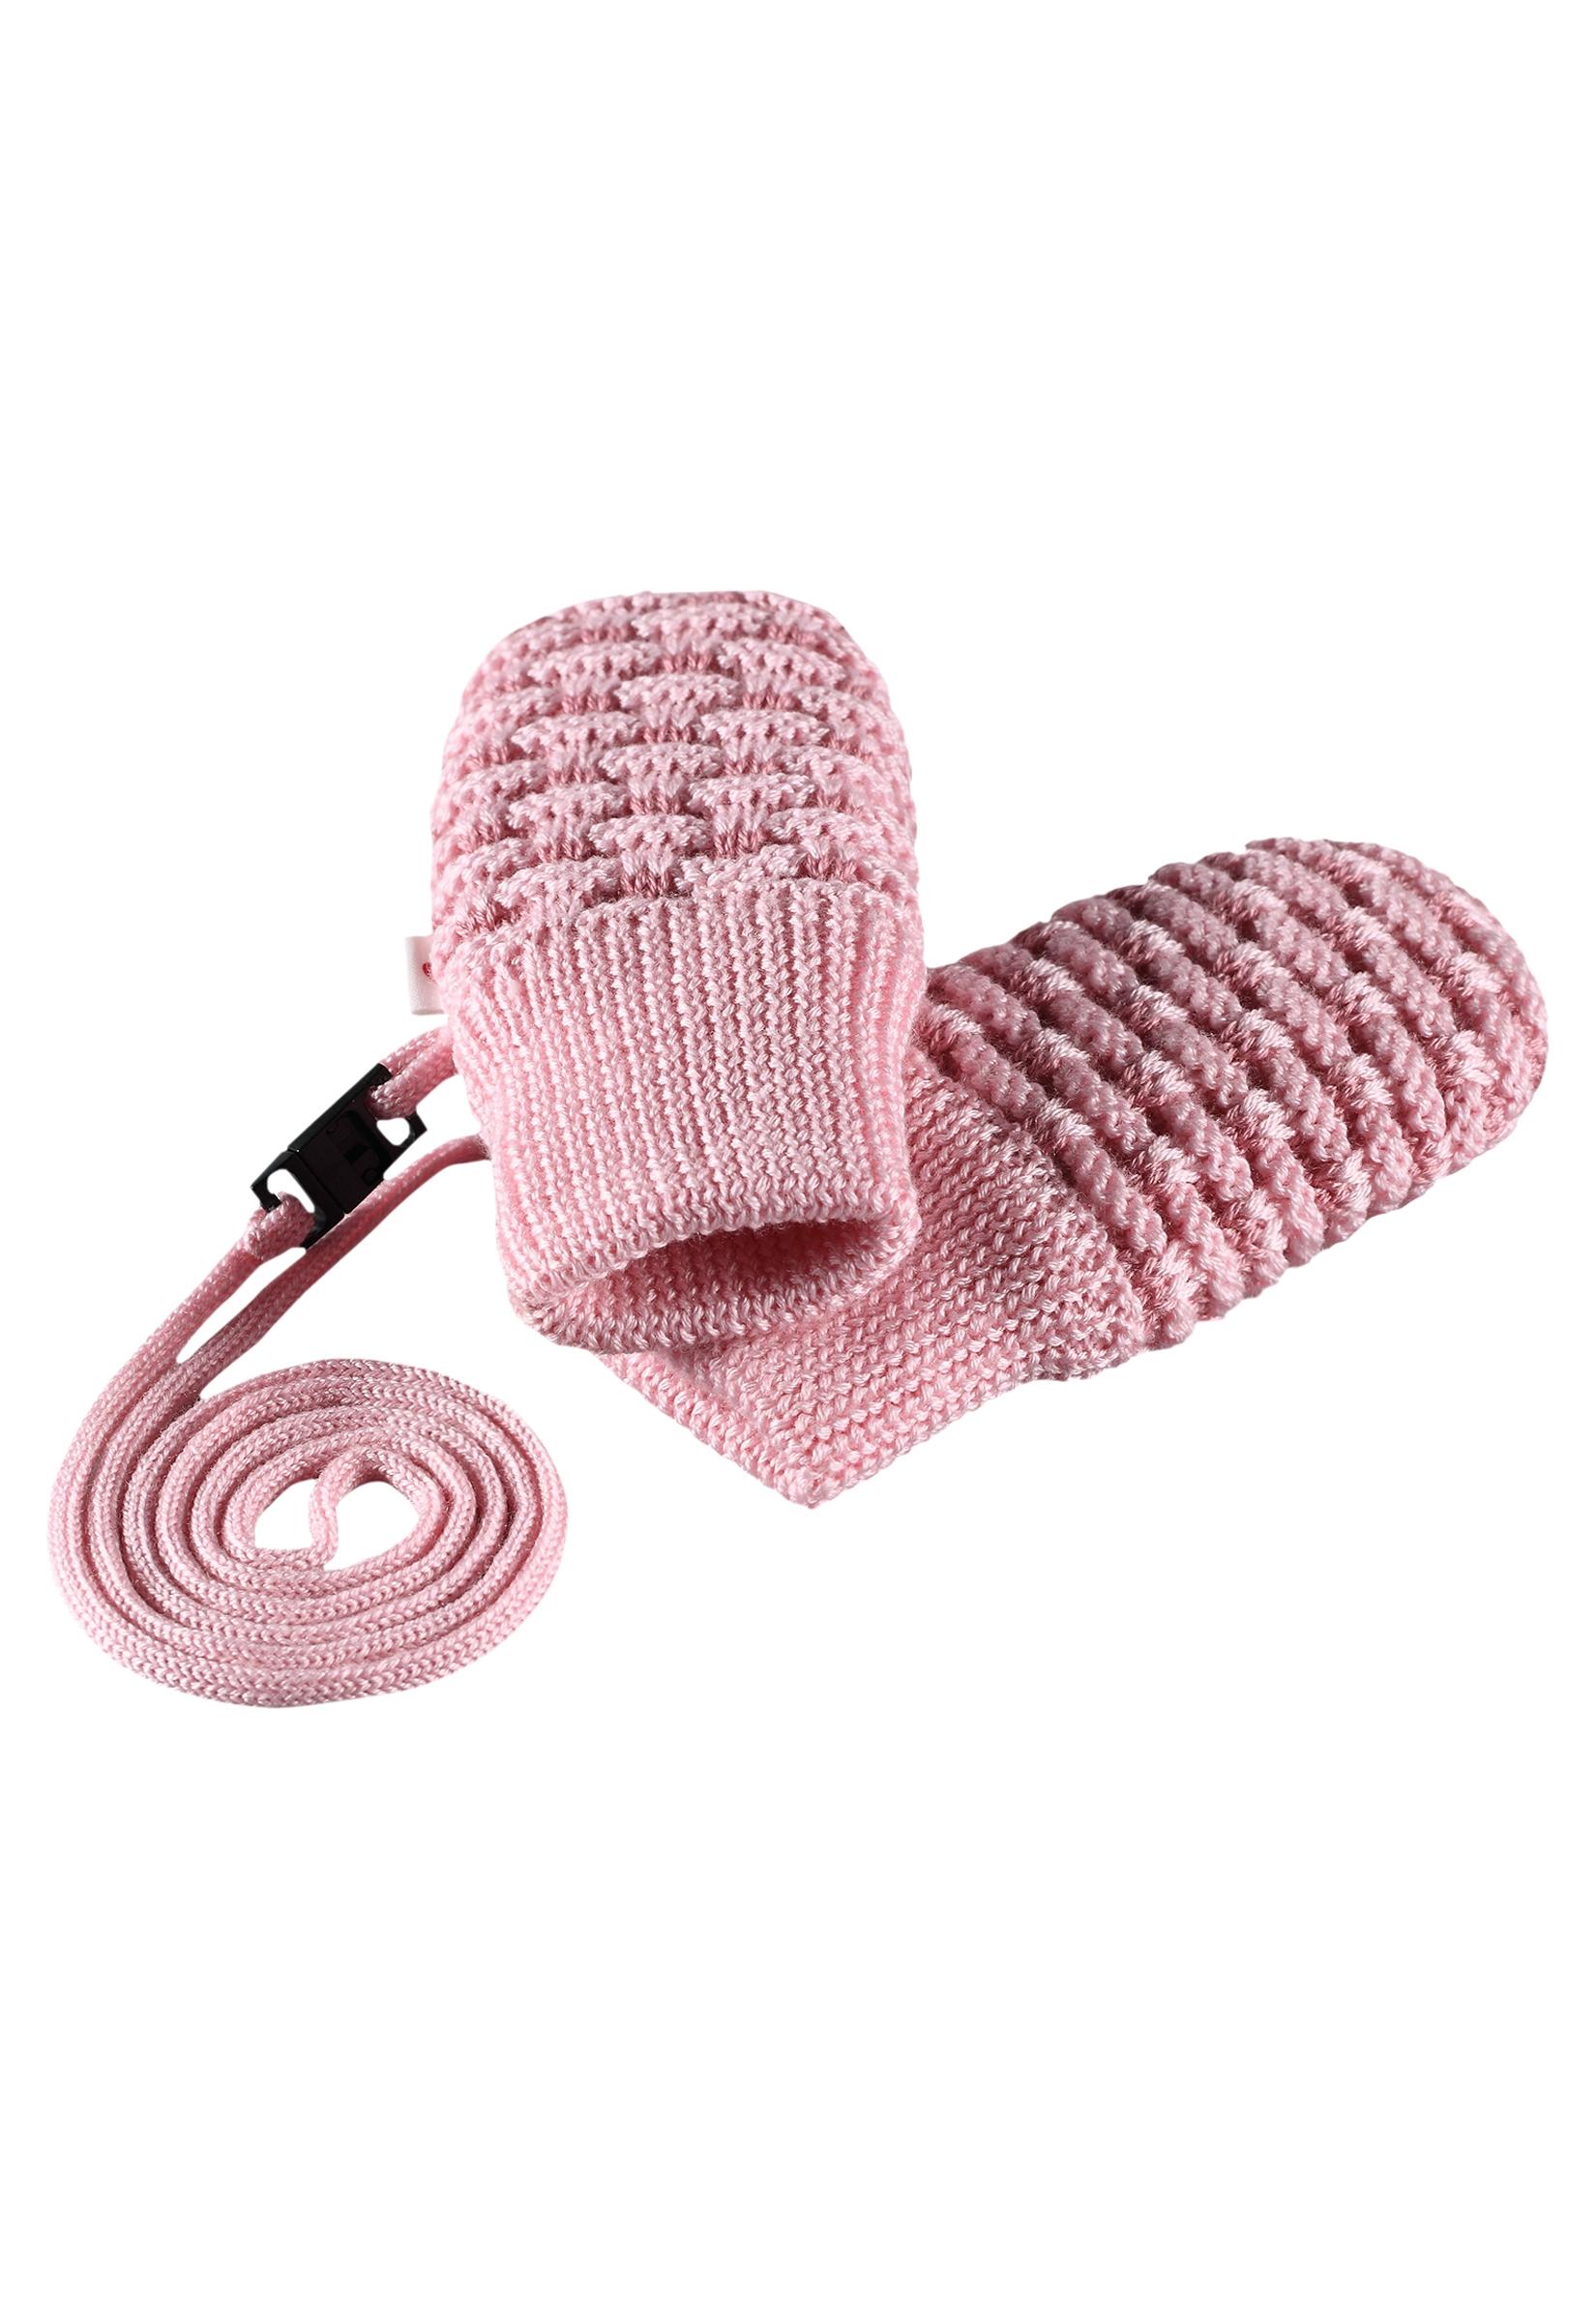 Варежки для девочки Reima розовый reima варежки для девочки reimatec reima